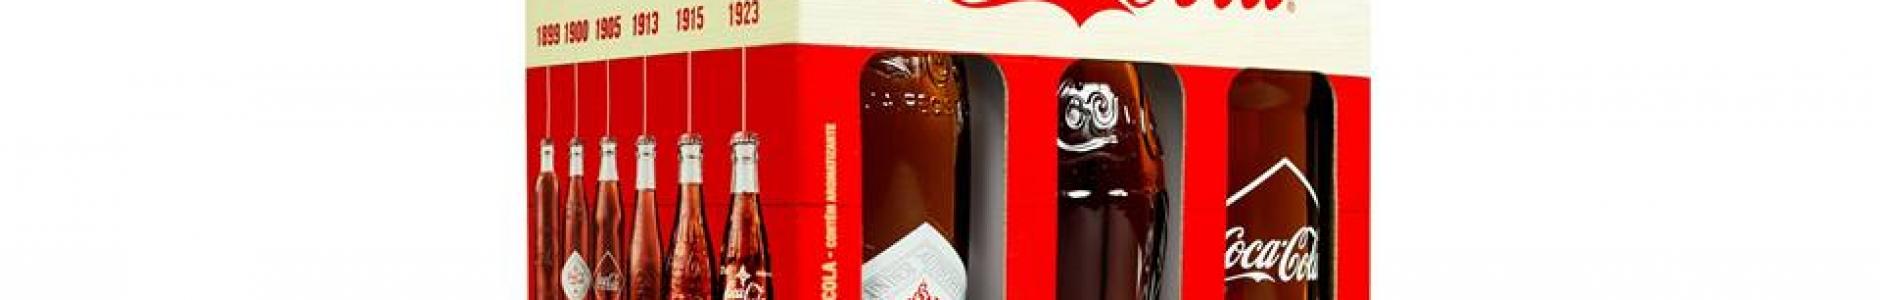 Coca-Cola apresenta embalagem com garrafas vintage